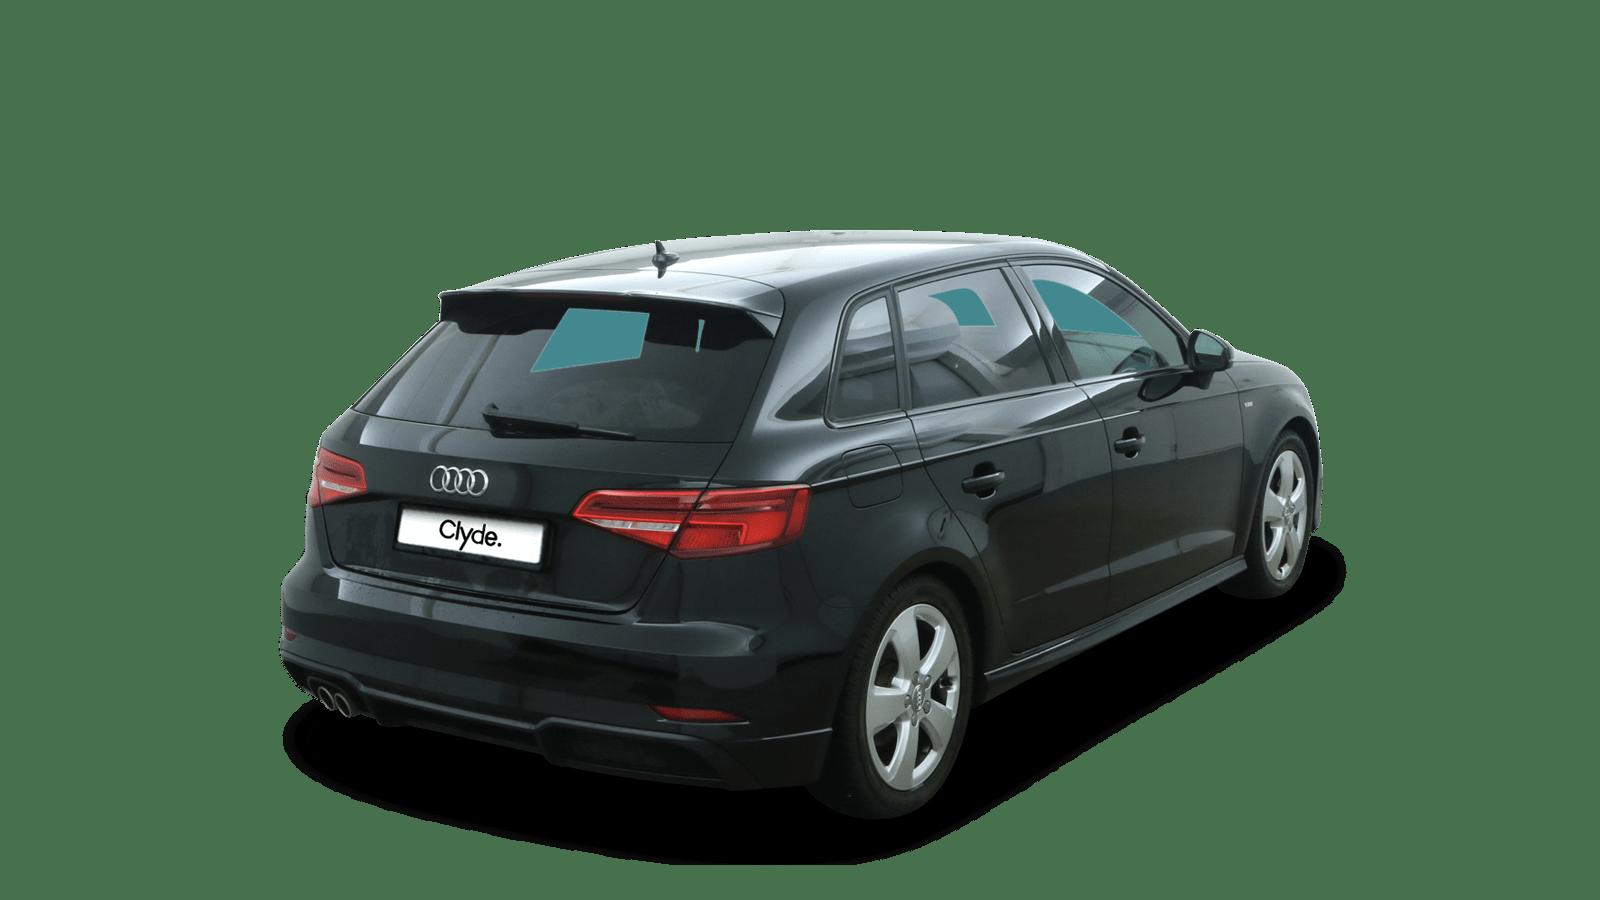 Audi A3 Sportback Black back - Clyde car subscription